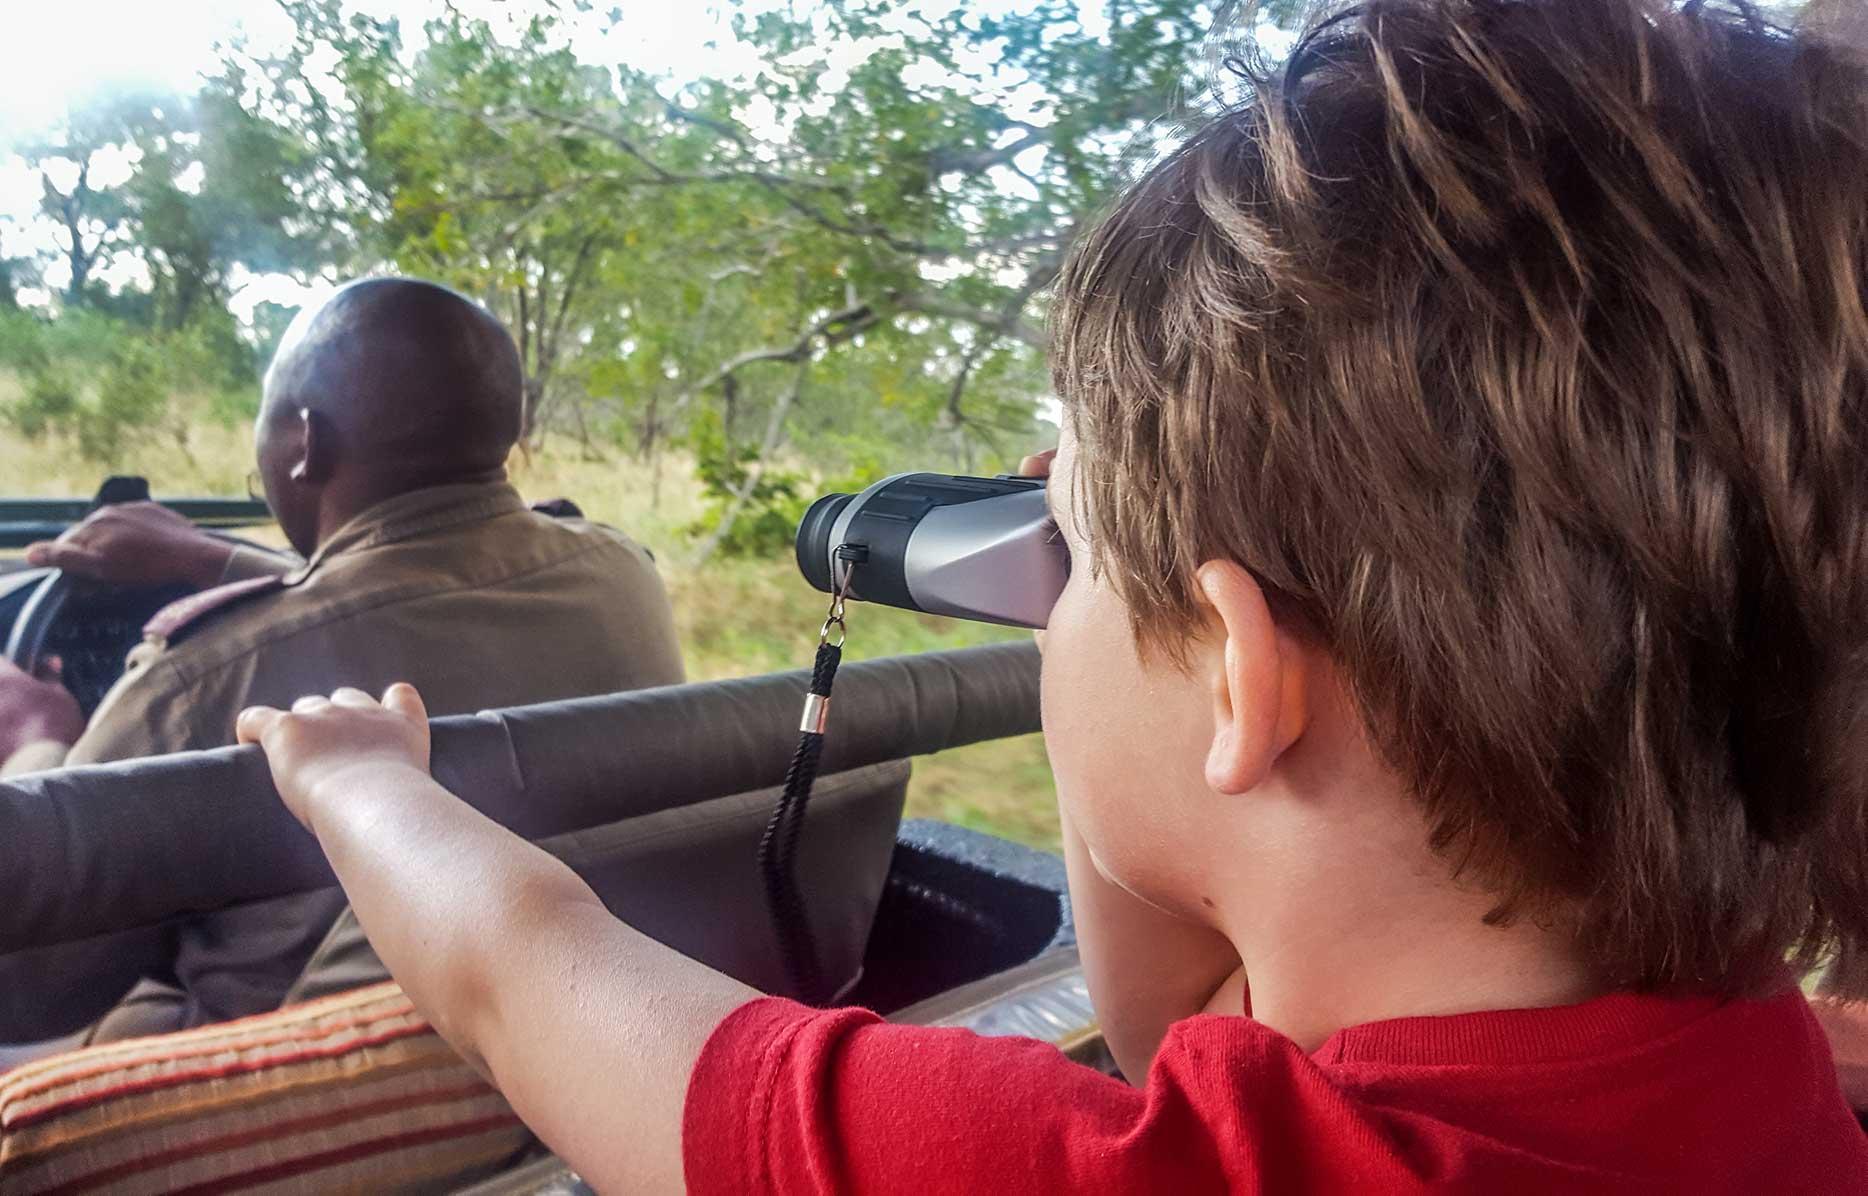 Safari_SouthAfrica_SabiSabi